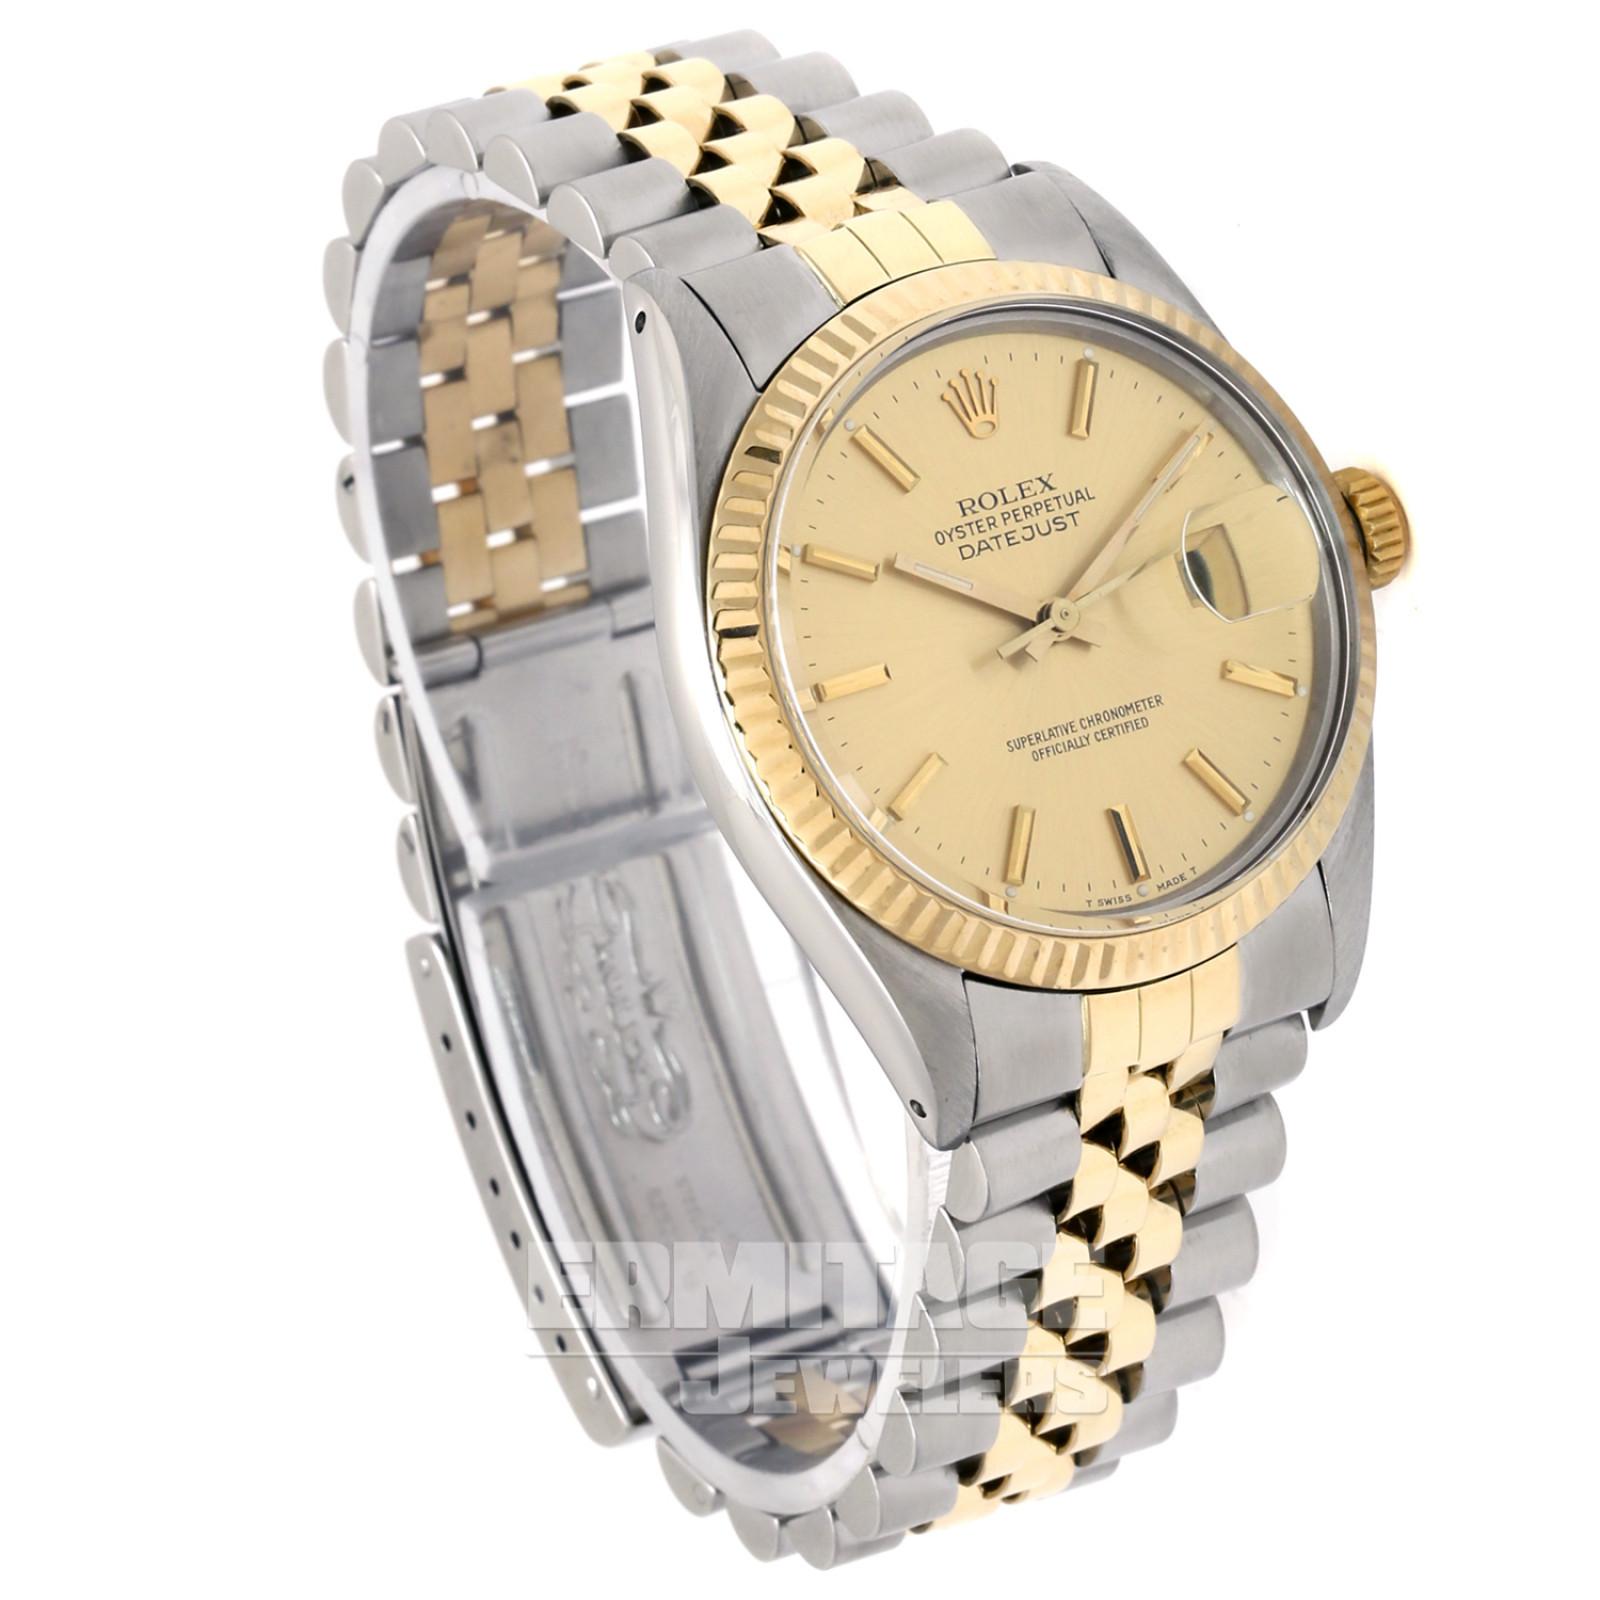 Rolex Datejust 16013 36 mm